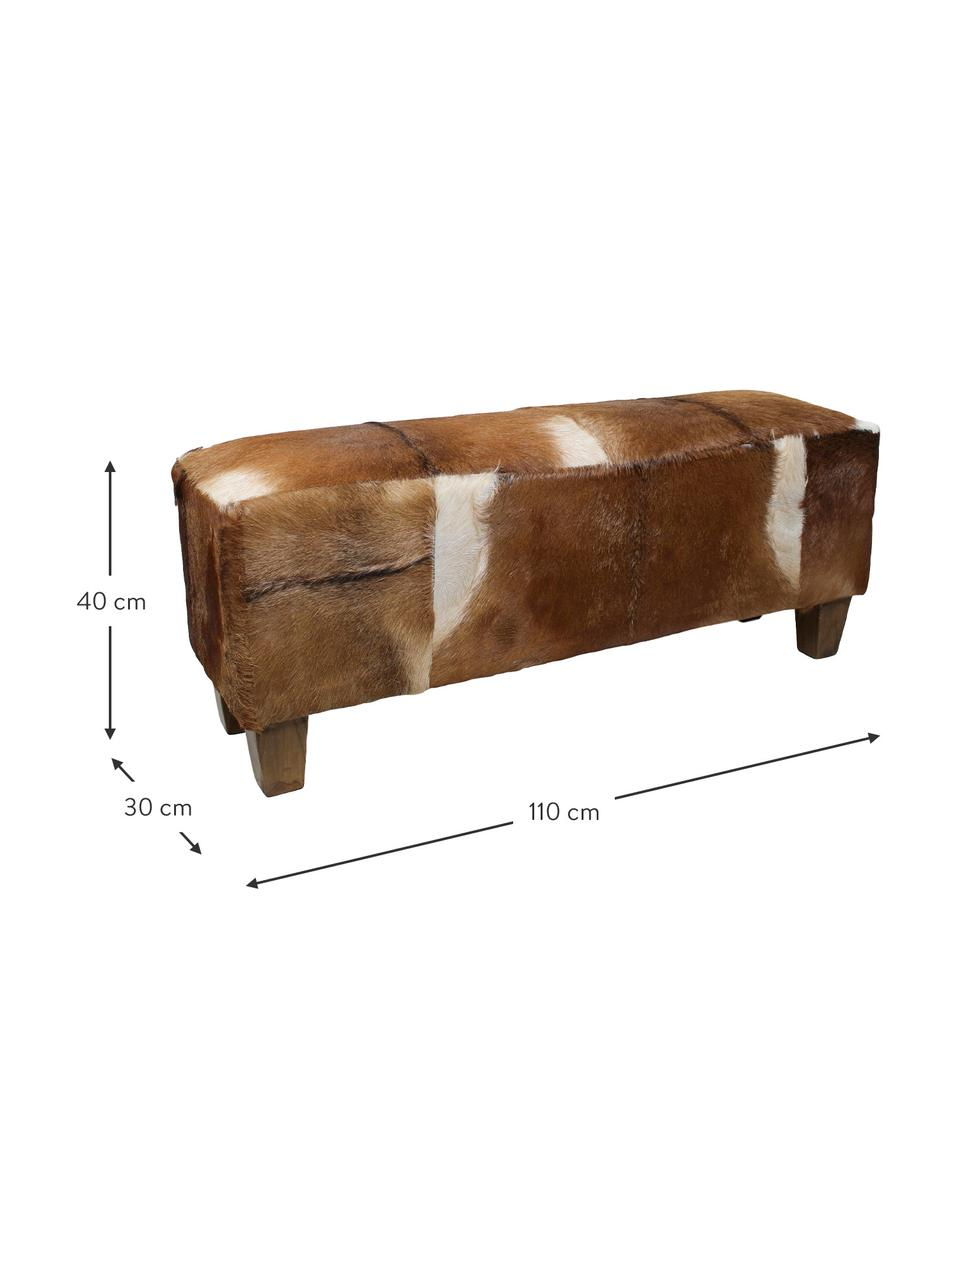 Sitzbank Bangku mit Ziegenfell, Bezug: Ziegenfell, Füße: Teakholz, Bezug: Ziegenfell, Braun und Weiß Füße: Teakholz, 110 x 40 cm